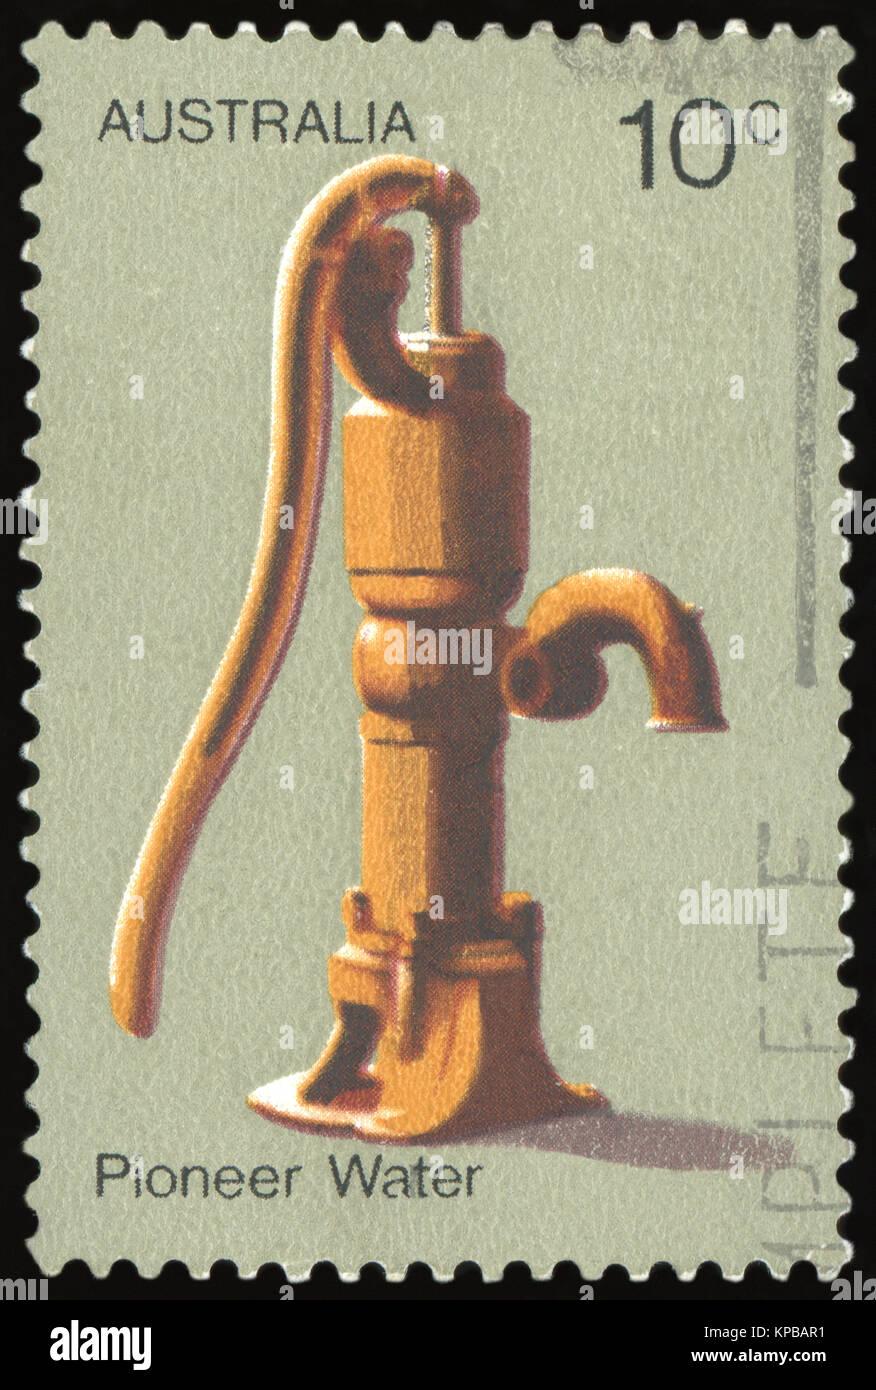 AUSTRALIA - CIRCA 1972: a stamp printed in the Australia shows Water Pump, Australian Pioneer Life, circa 1972 - Stock Image